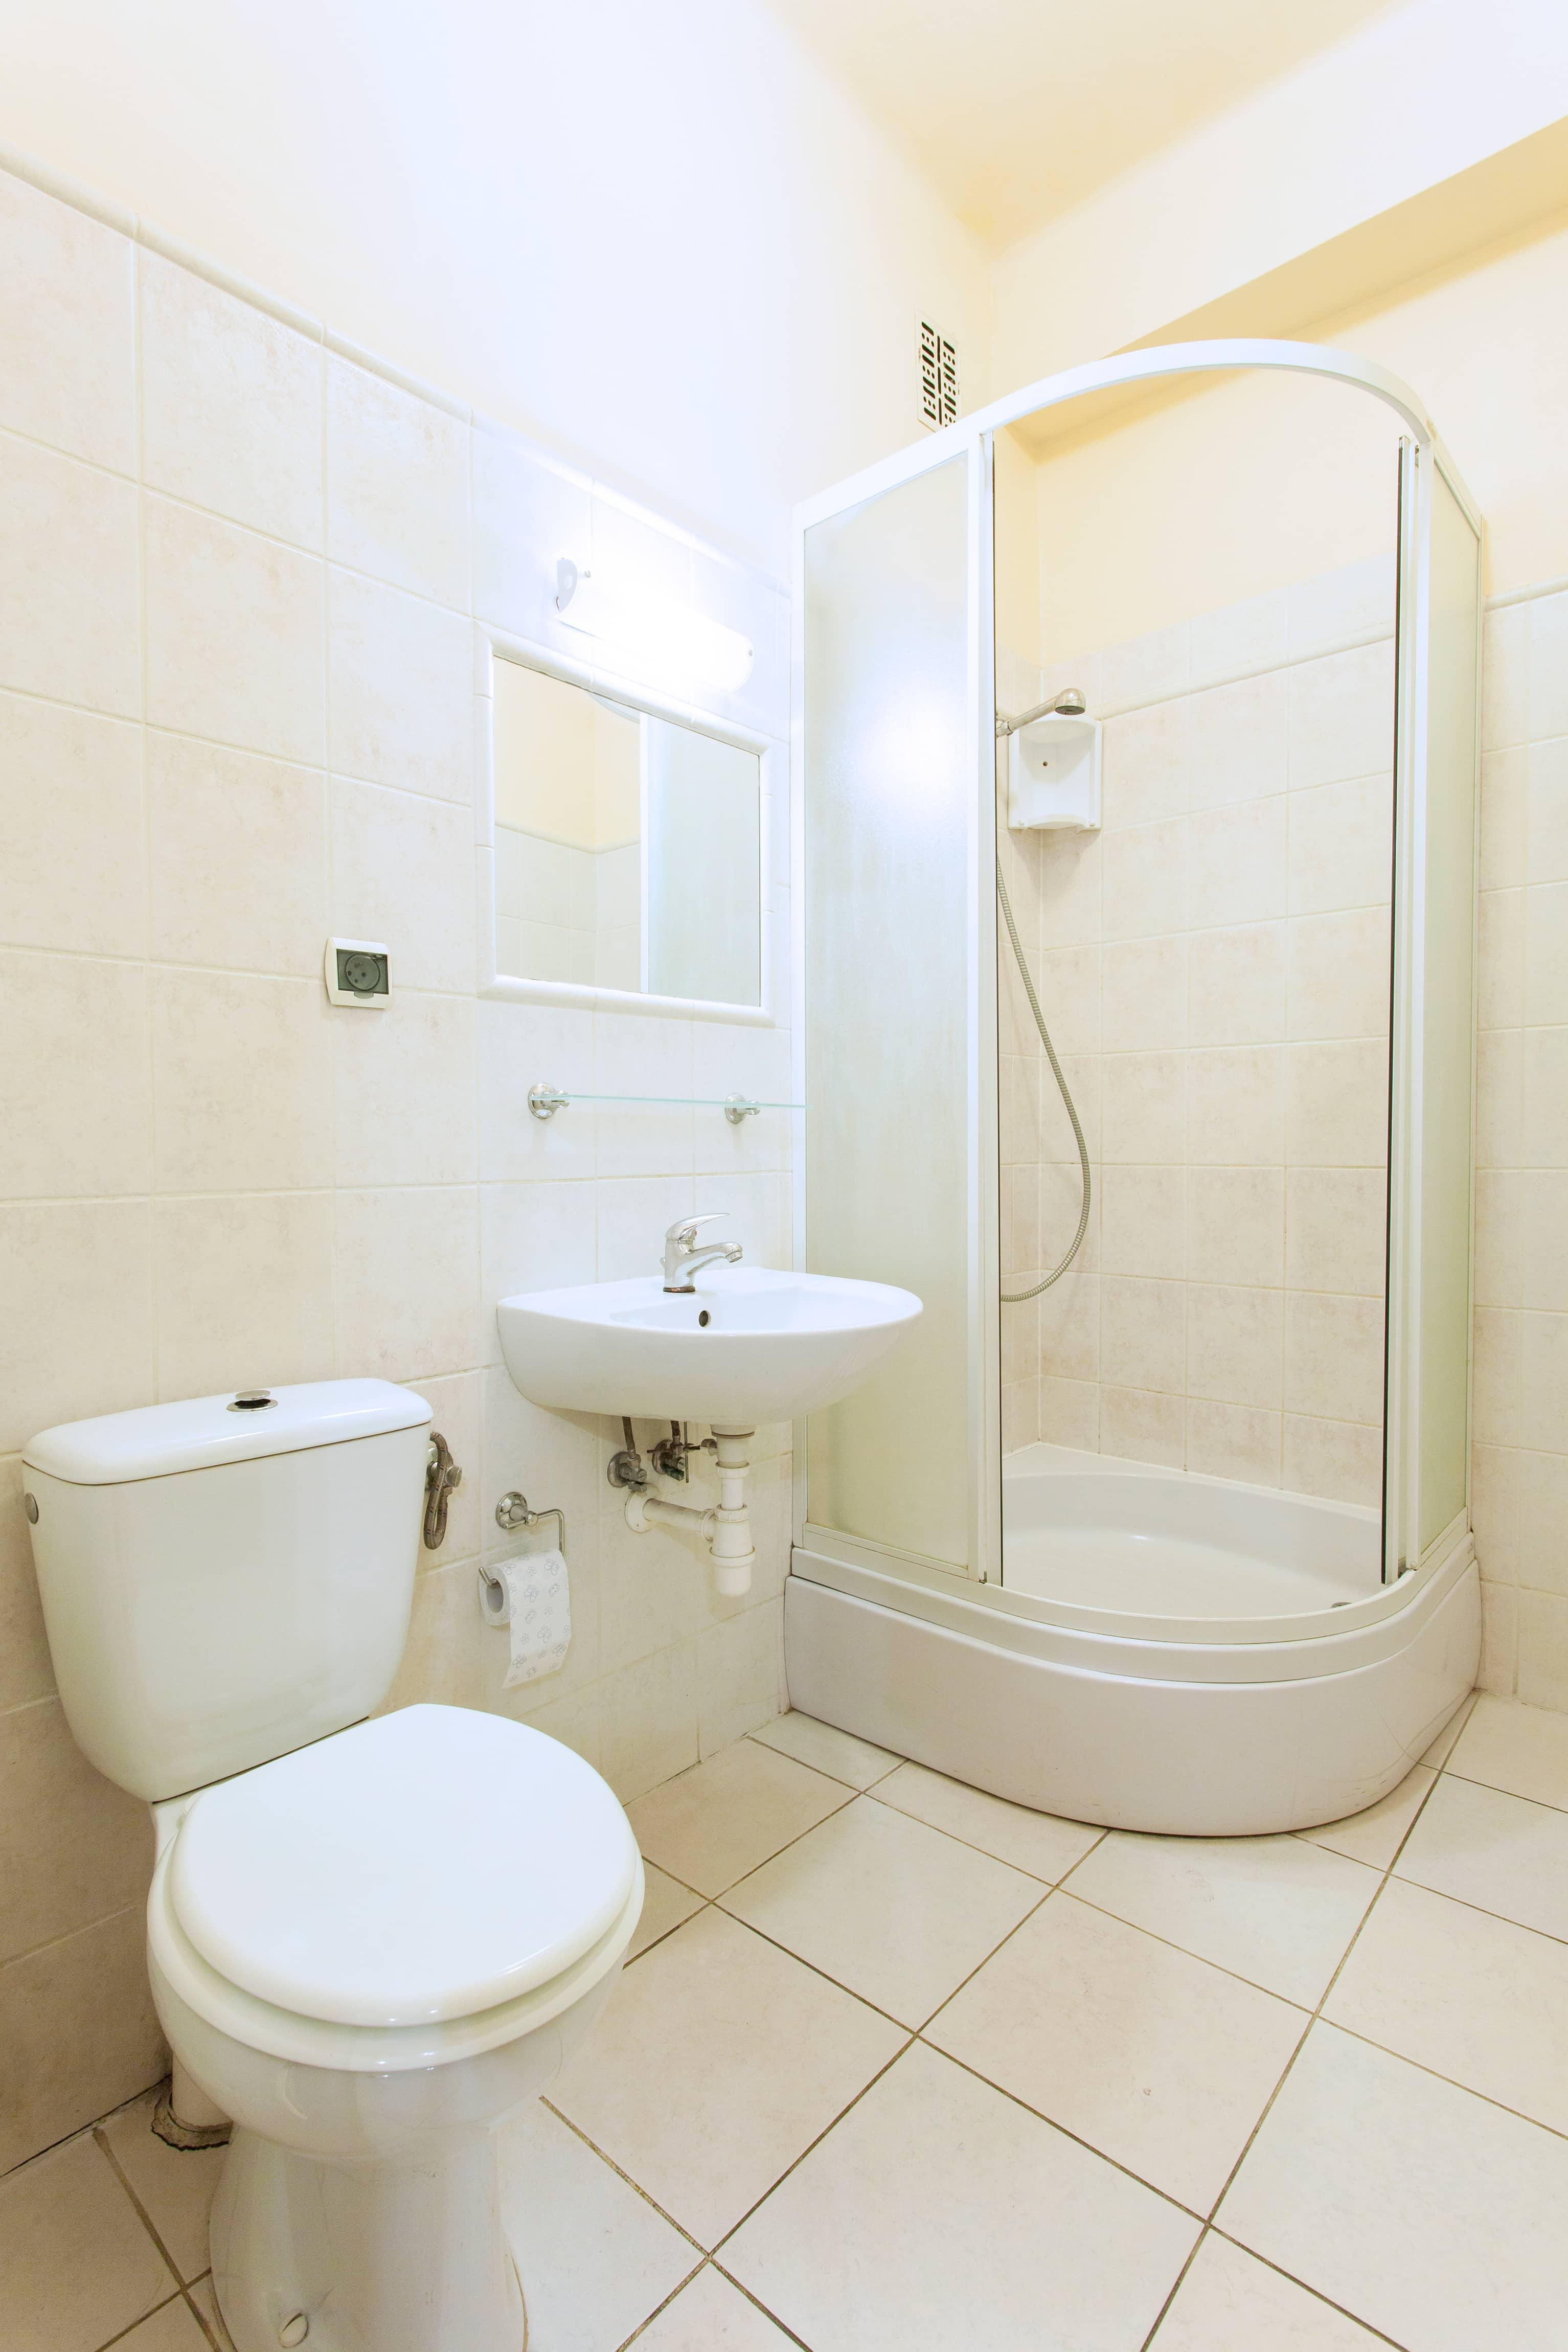 5 kkraj_iz łazienka